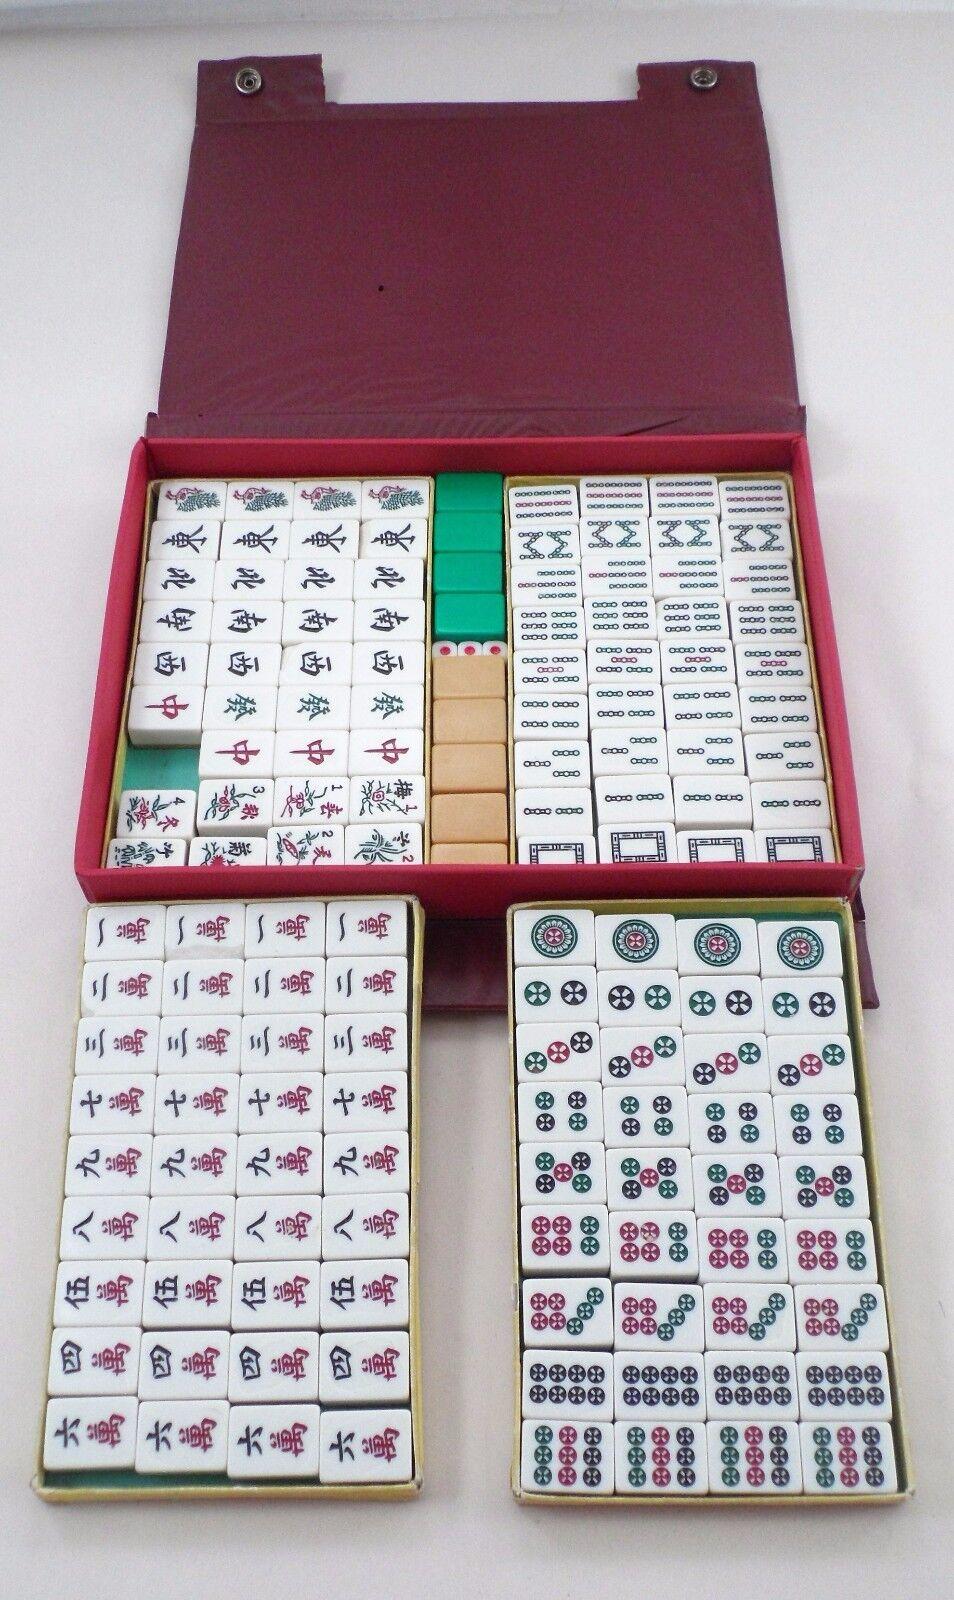 1950 S 1960 S Vintage Mah jong Mahjong 2 Tone Tile Set in ORIG Travel Carry Case